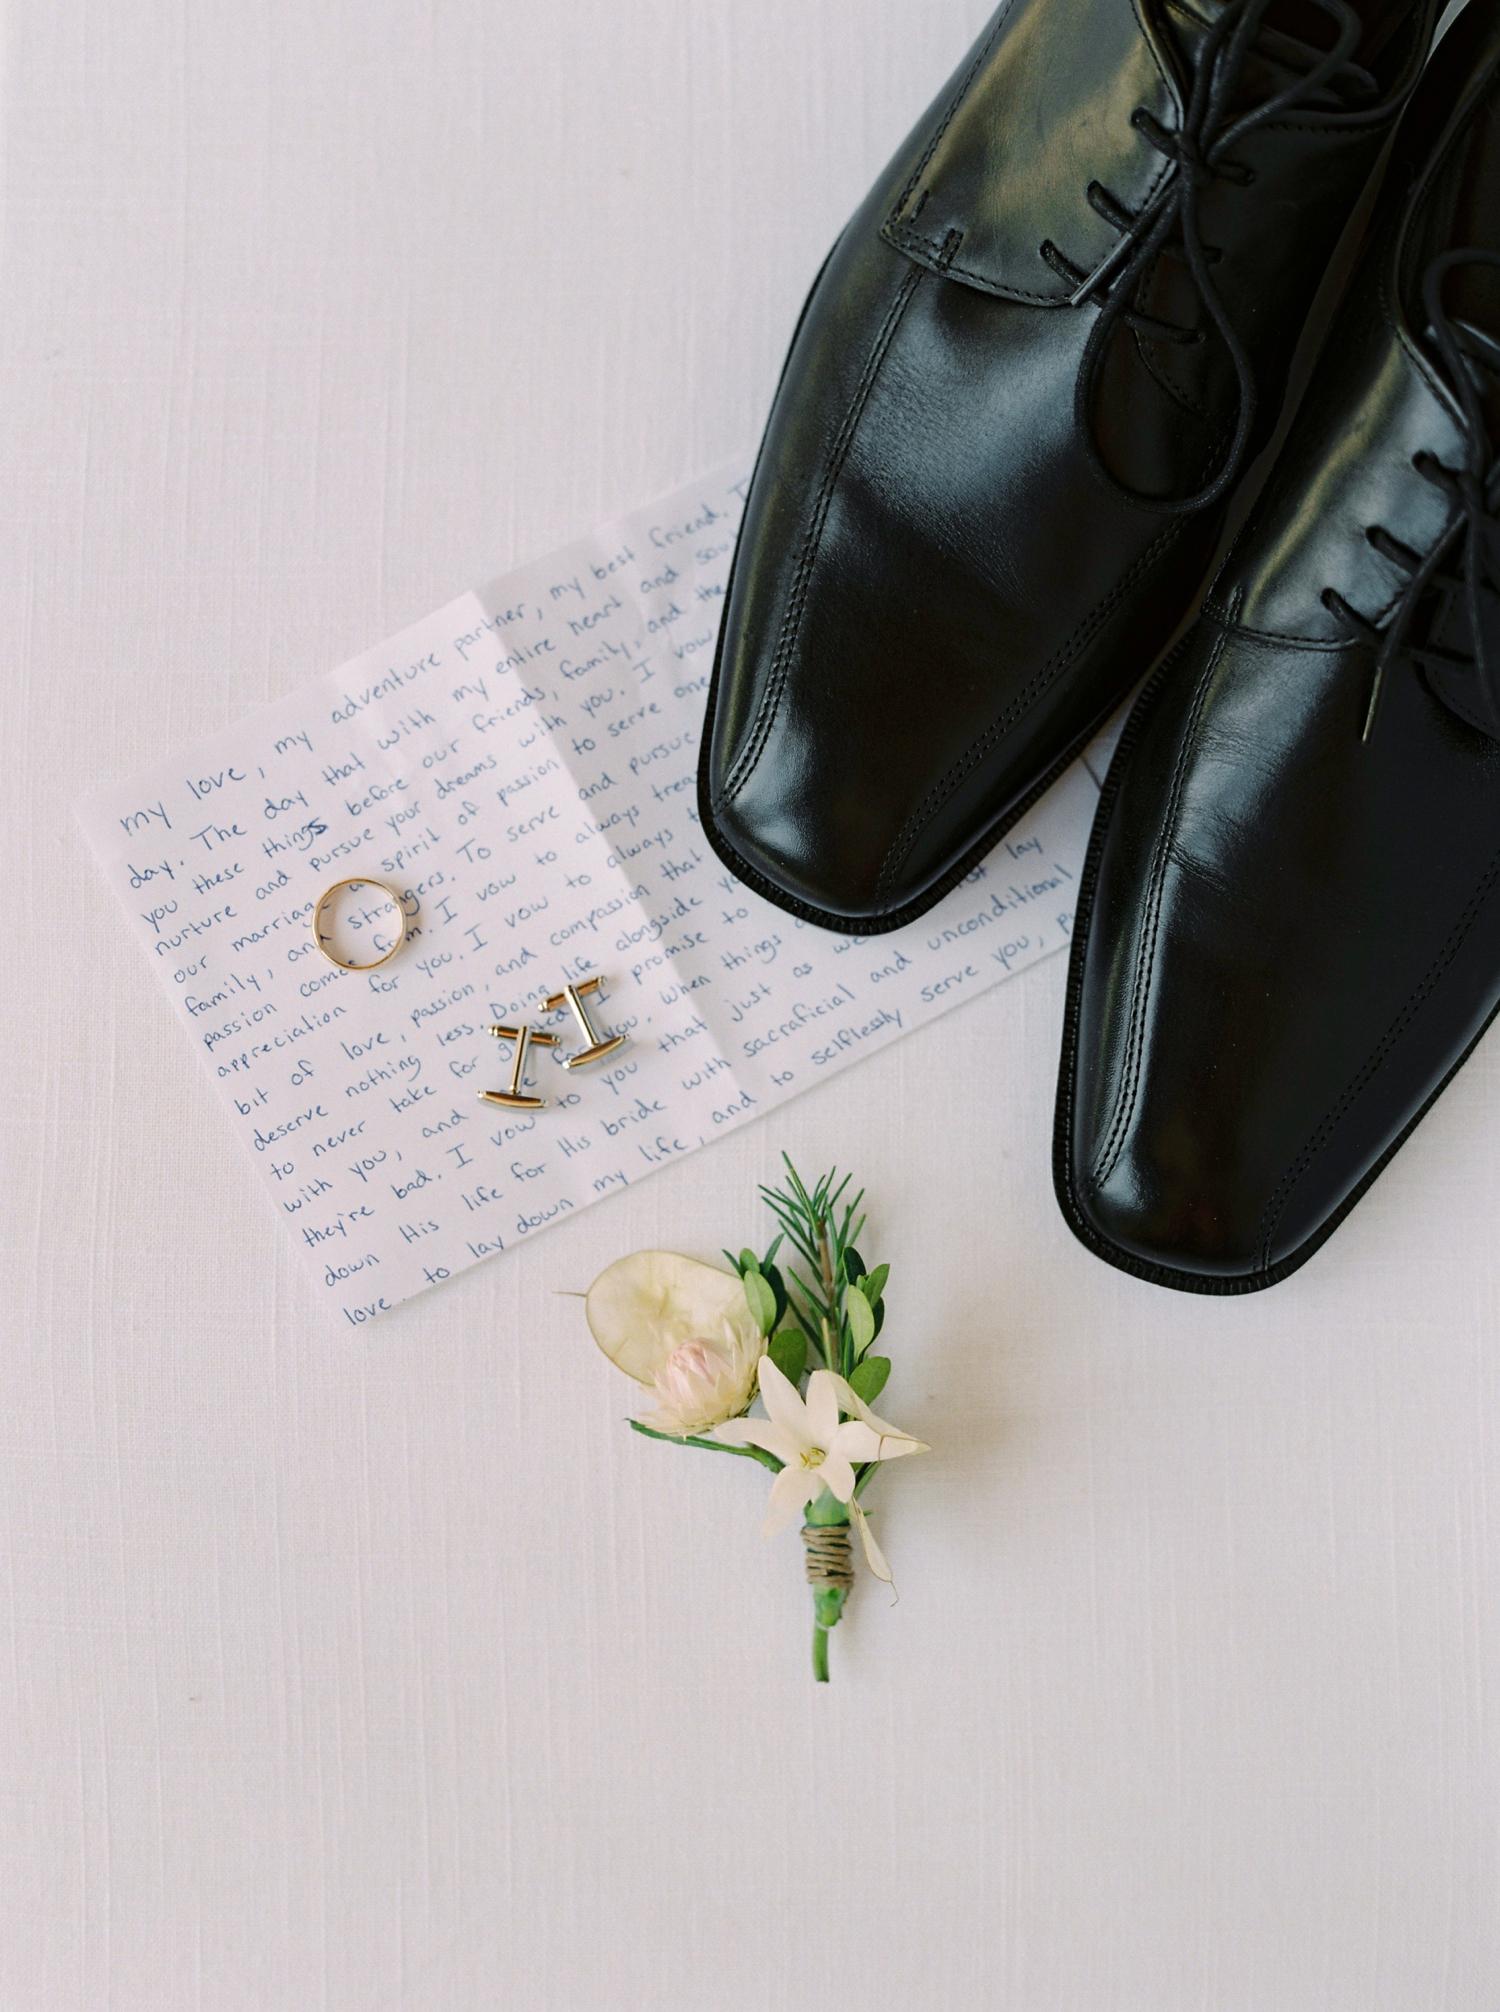 Calgary wedding photographers | georgia wedding photographers | fine art film | Justine Milton Photography | wedding details | georgia wedding | groom shoes | wedding rings